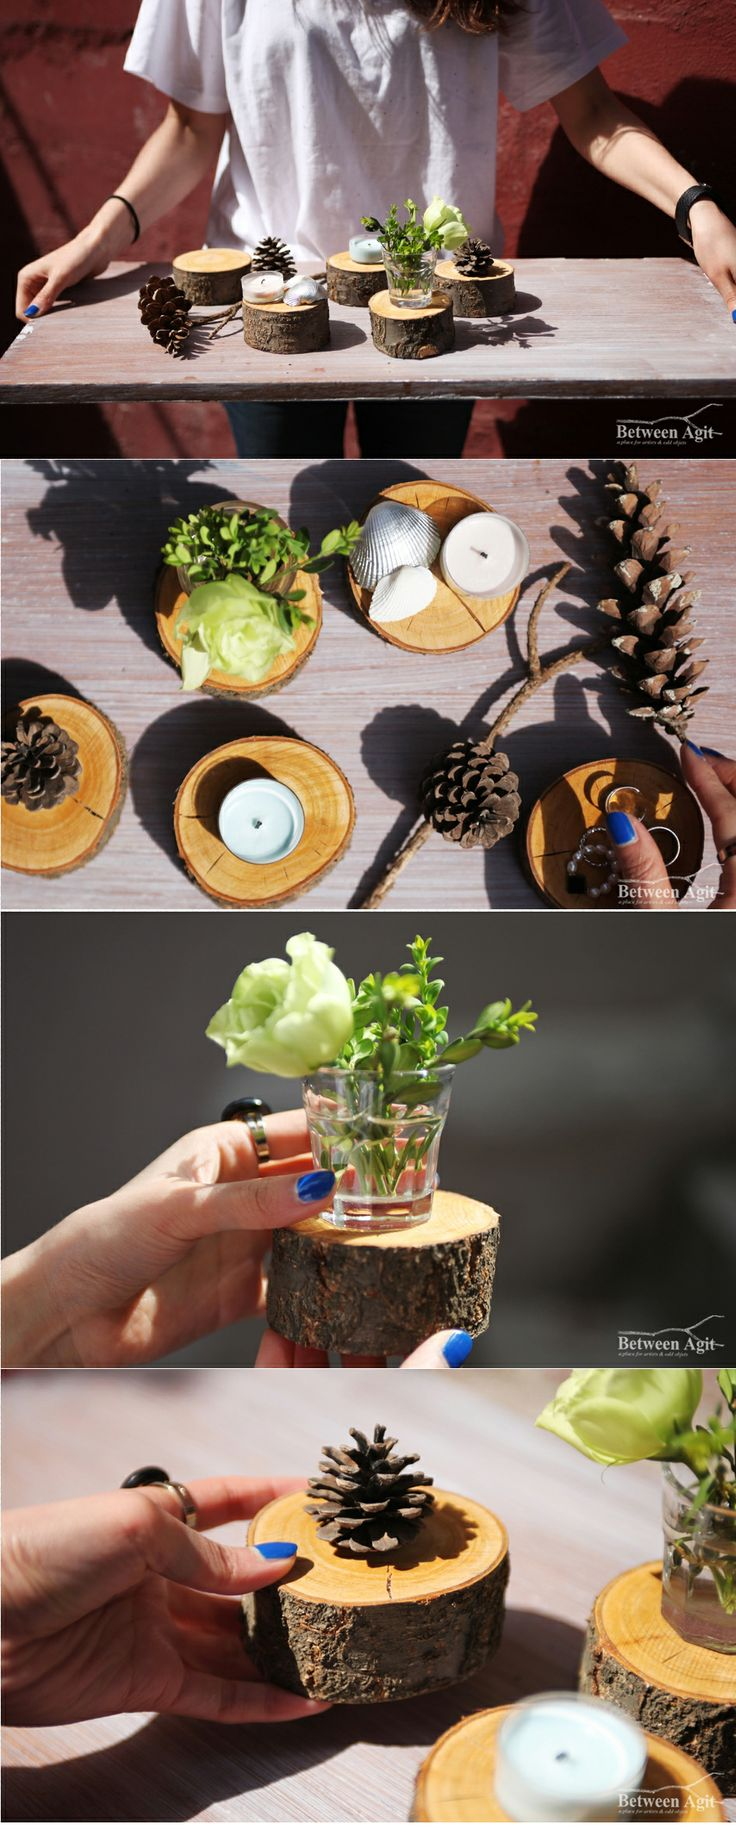 cherry wood coaster, 솔방울, cone, betweenagit 전지된 벚나무를 활용해 만든 우드코스터 비트윈아지트의 식목일 이벤트